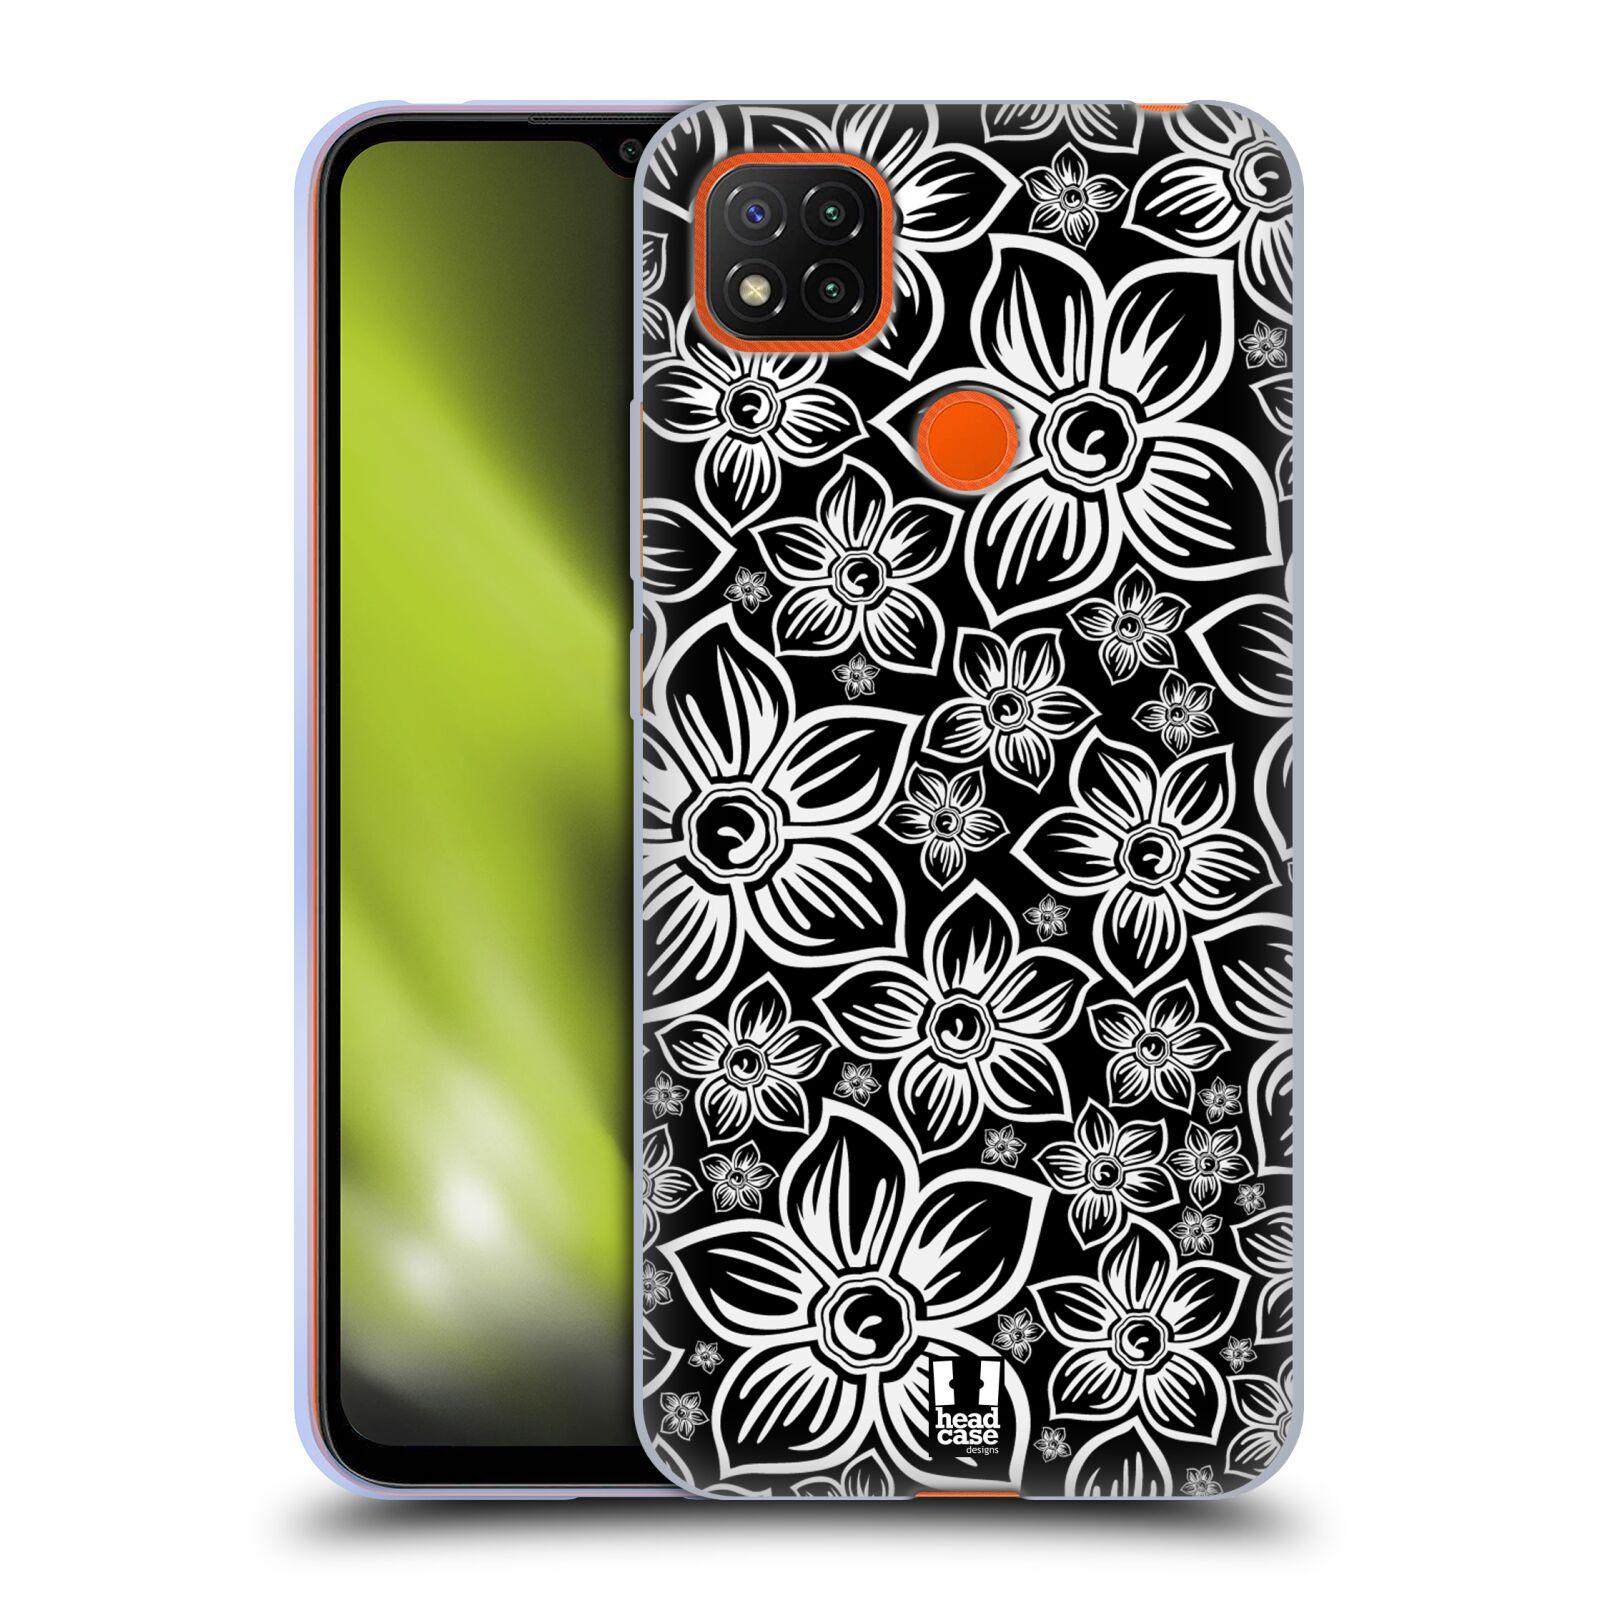 Silikonové pouzdro na mobil Xiaomi Redmi 9C - Head Case - FLORAL DAISY